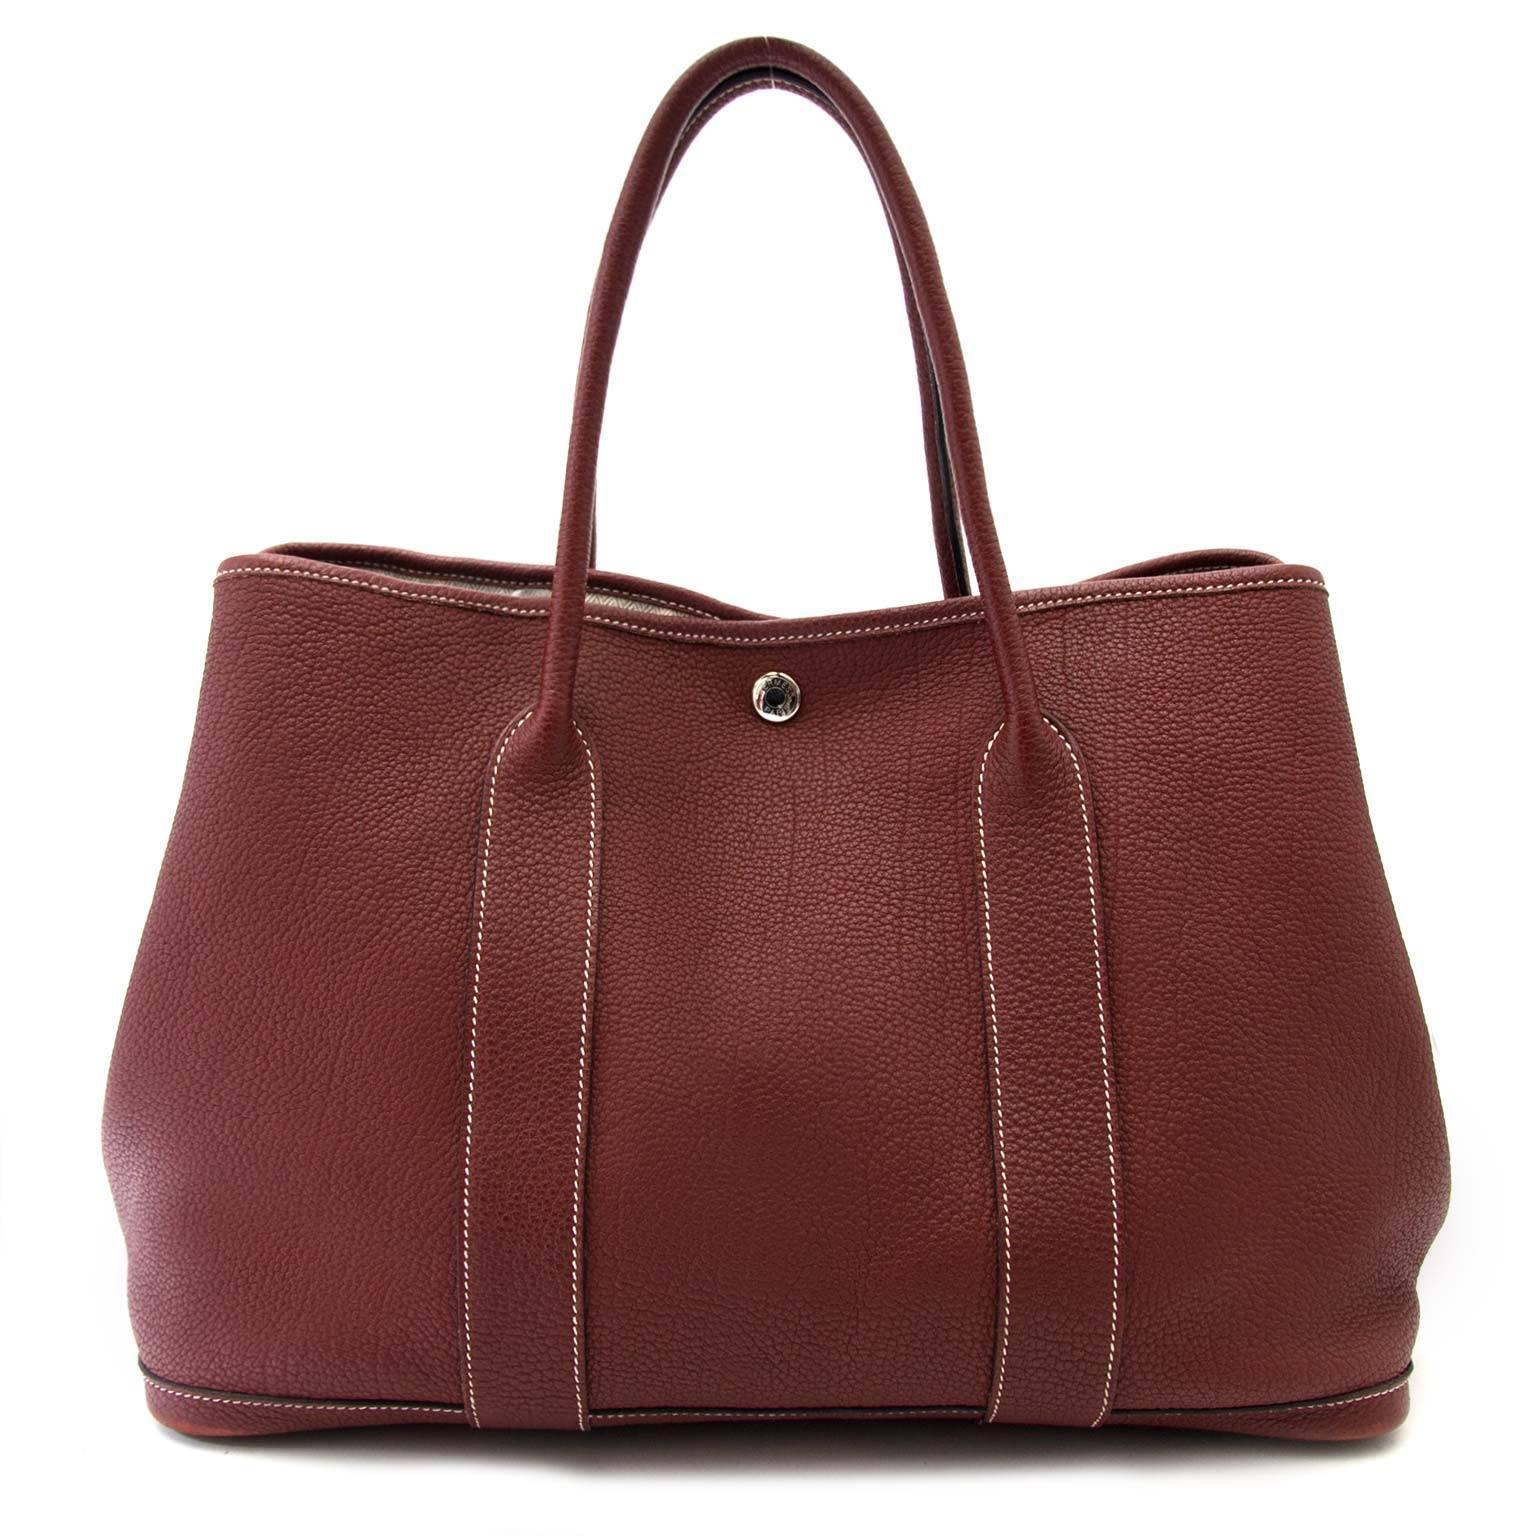 6832b445c72e Hermès Garden Party 36 Bordeaux tote bag at 1stdibs